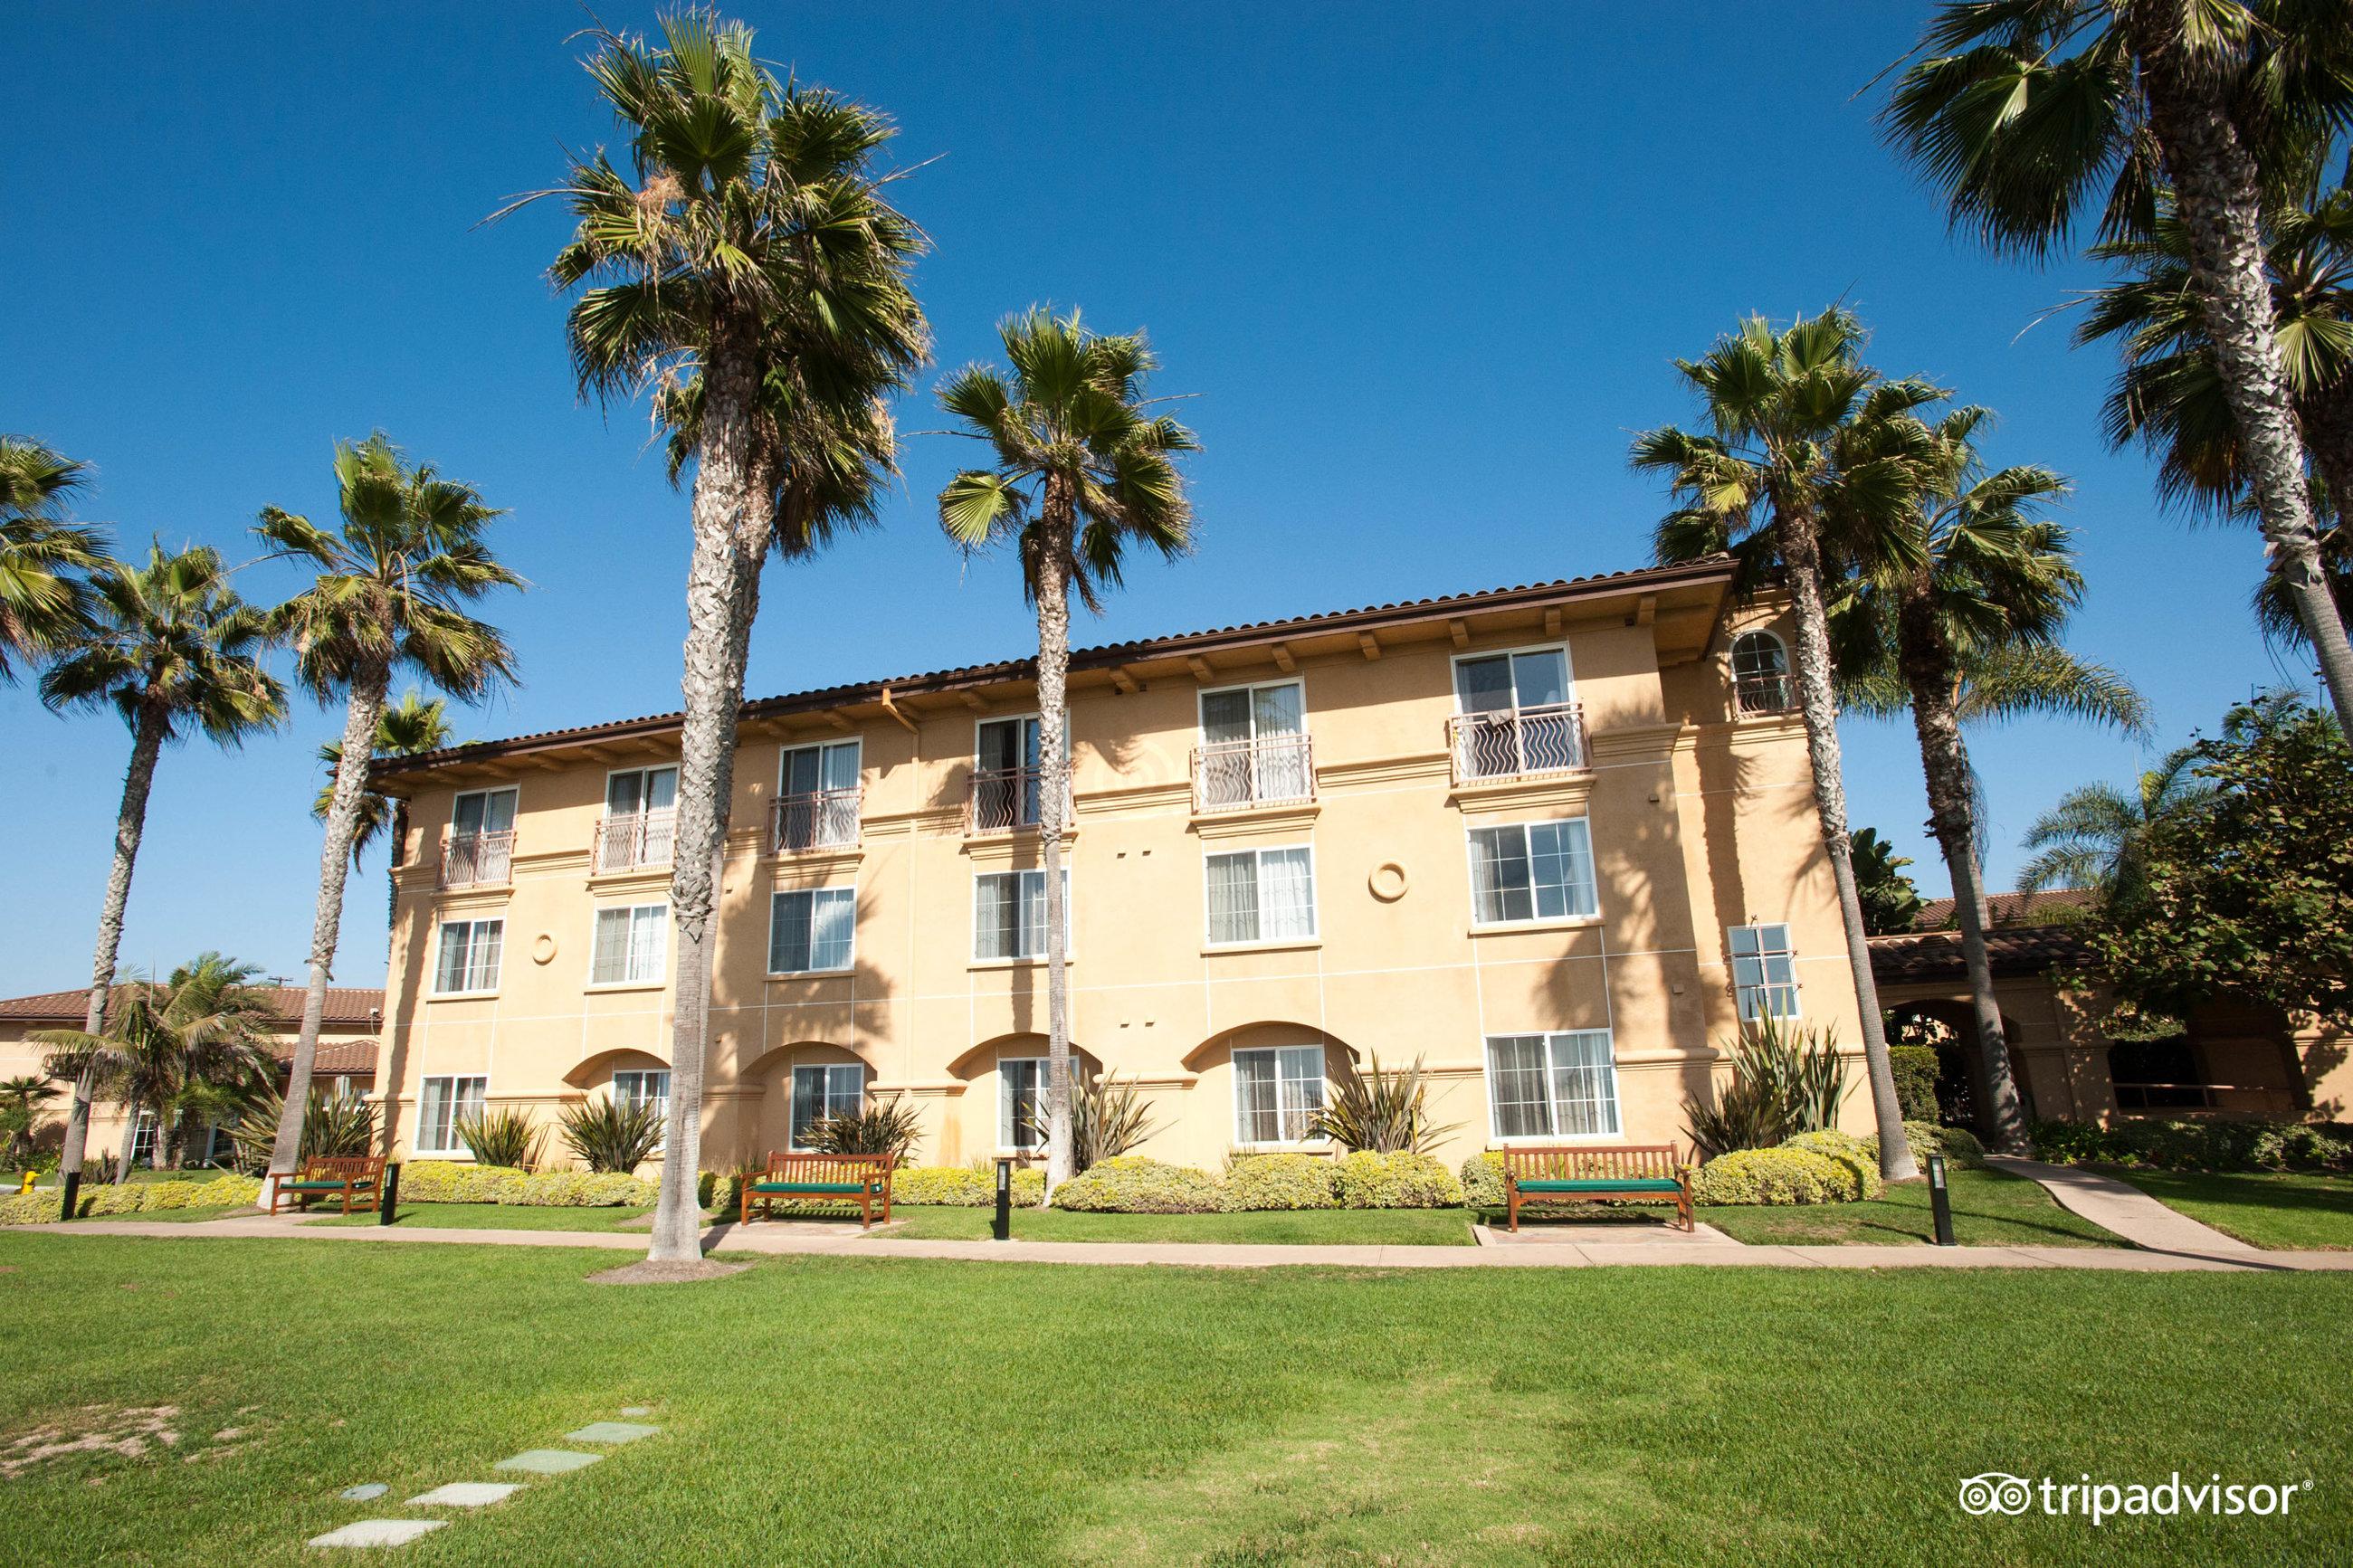 hilton garden inn carlsbad beach ca 2018 hotel review family